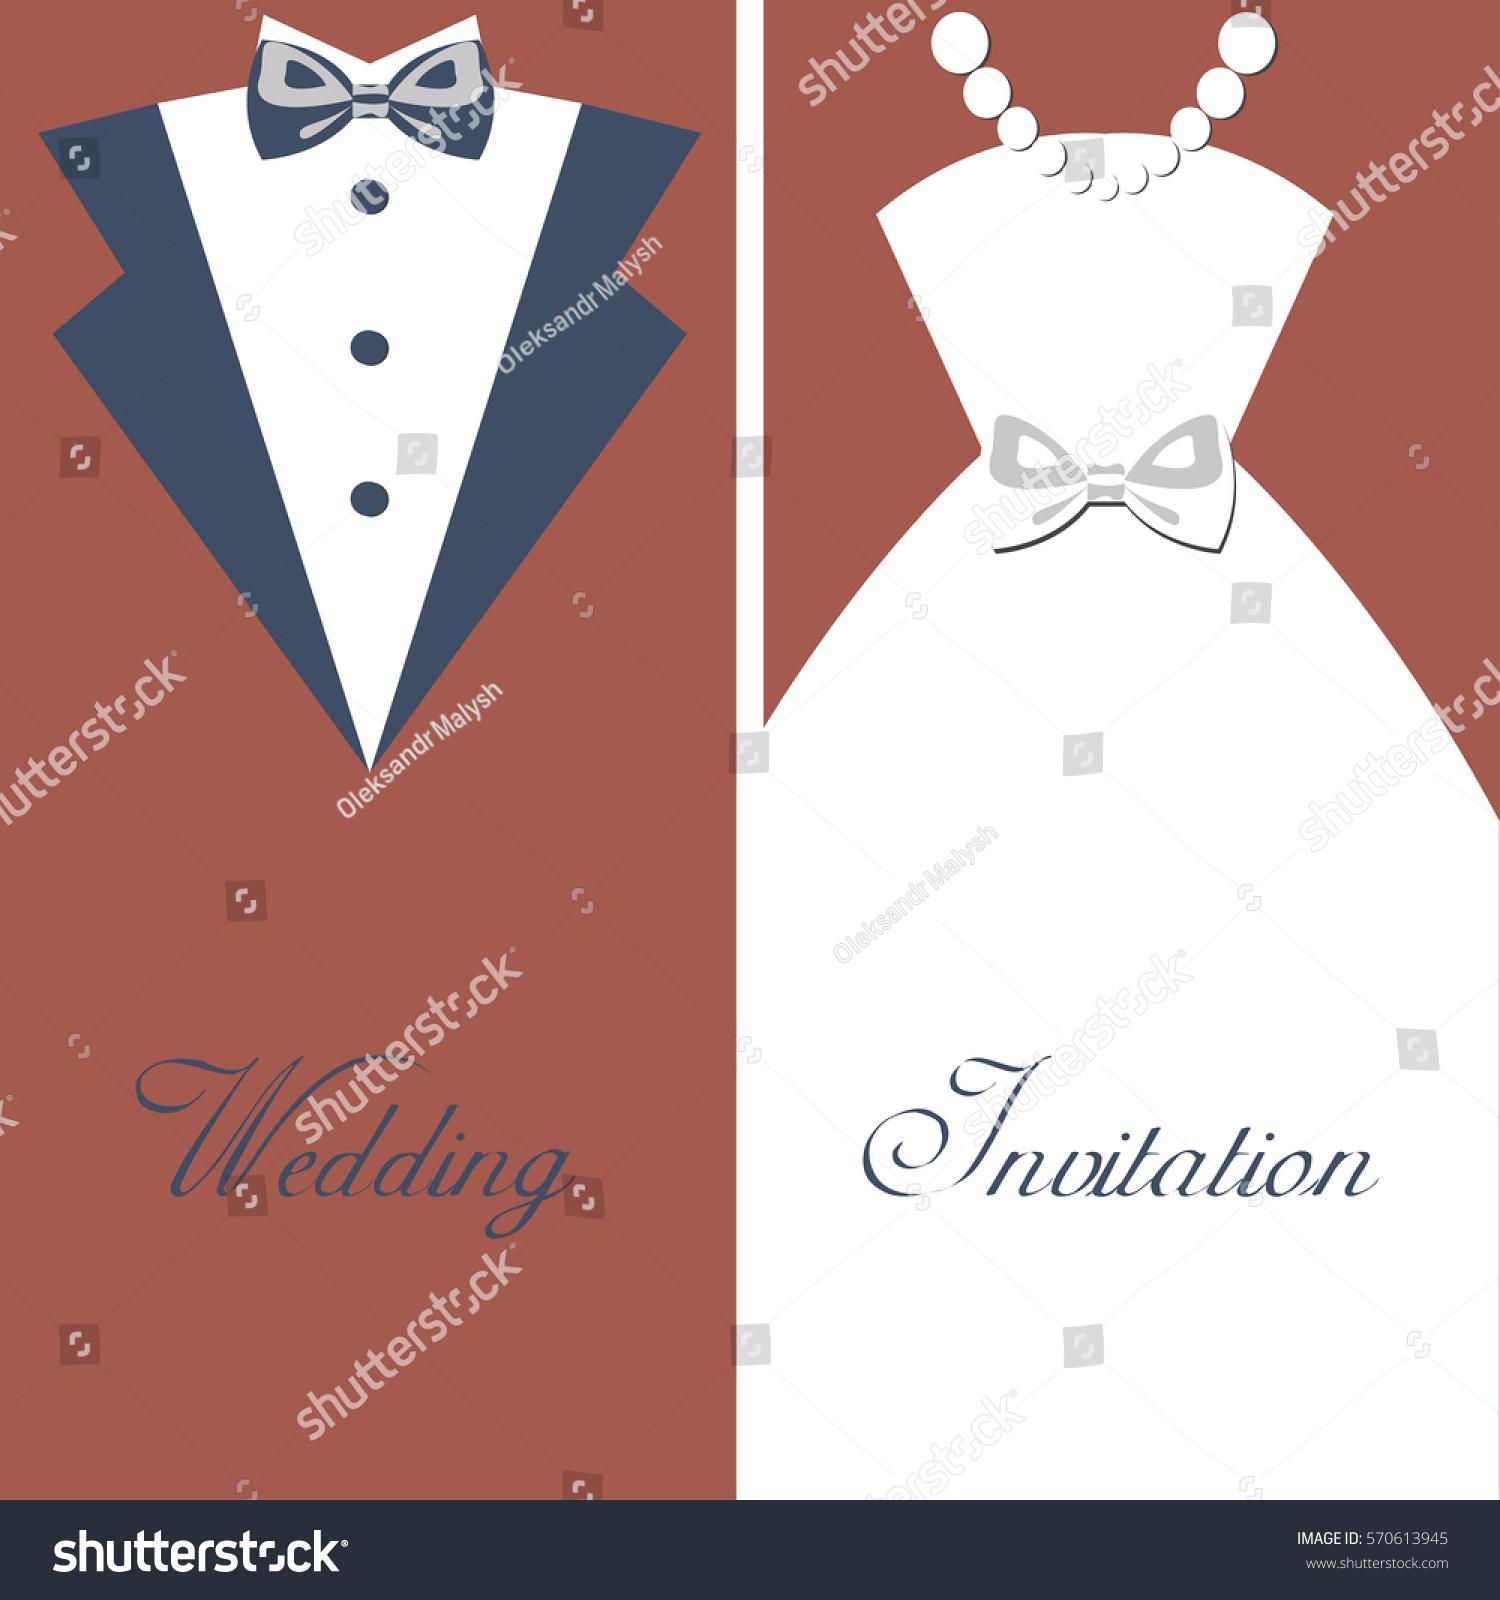 Wedding Invitation Vintage Design Elements Designers Stock Vector ...